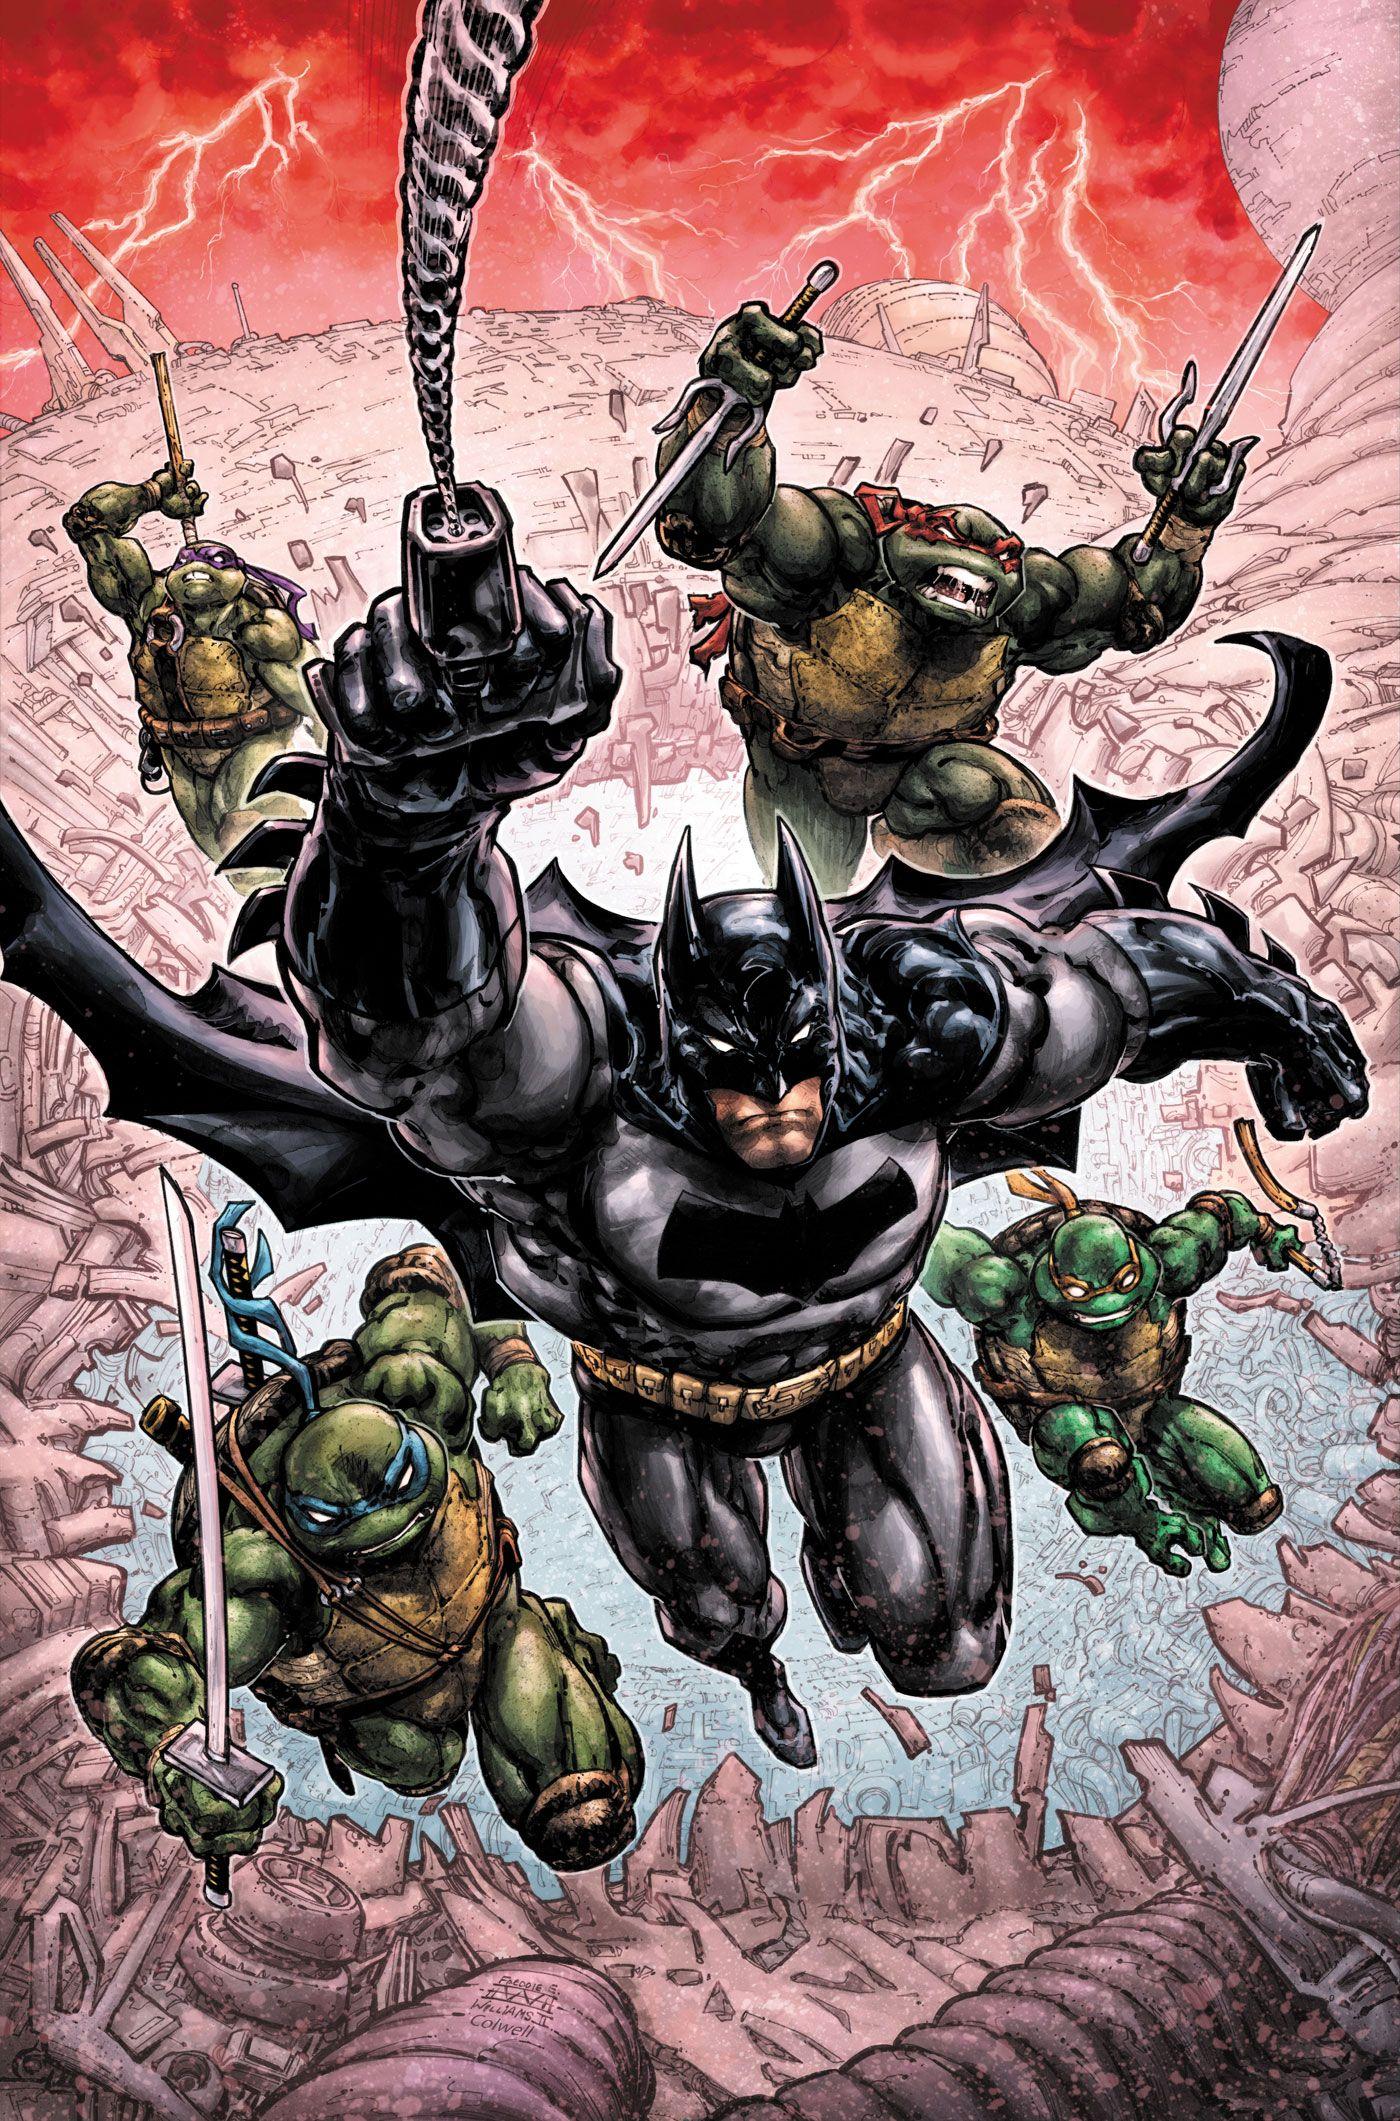 Batman/Teenage Mutant Ninja Turtles v.3 #1 Sets Up A Gem of a Crossover